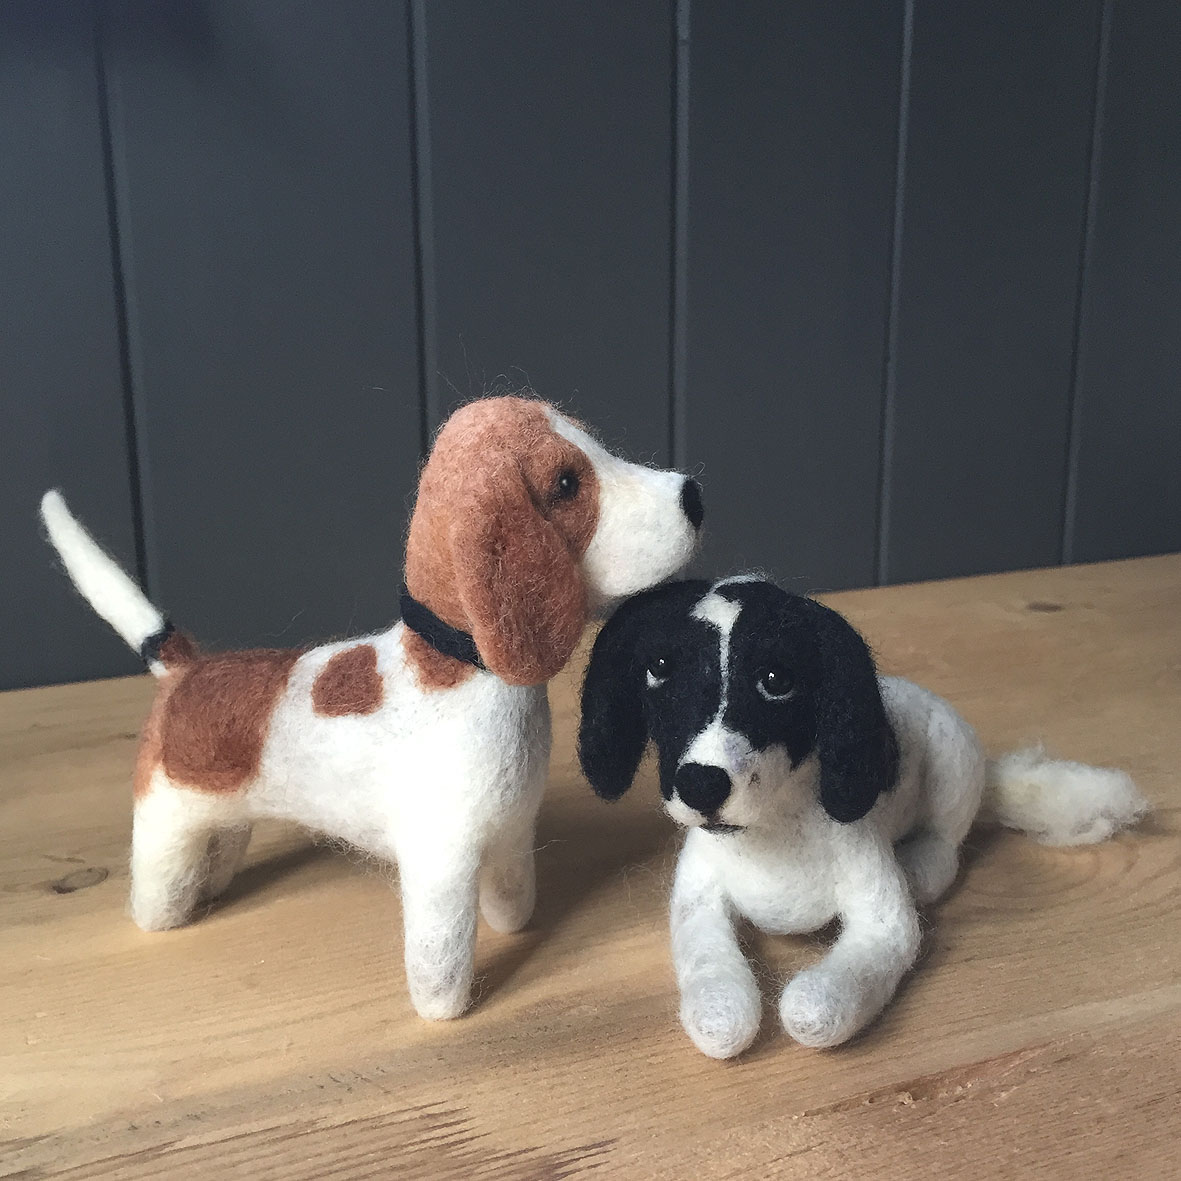 Beagle and small dog.jpg